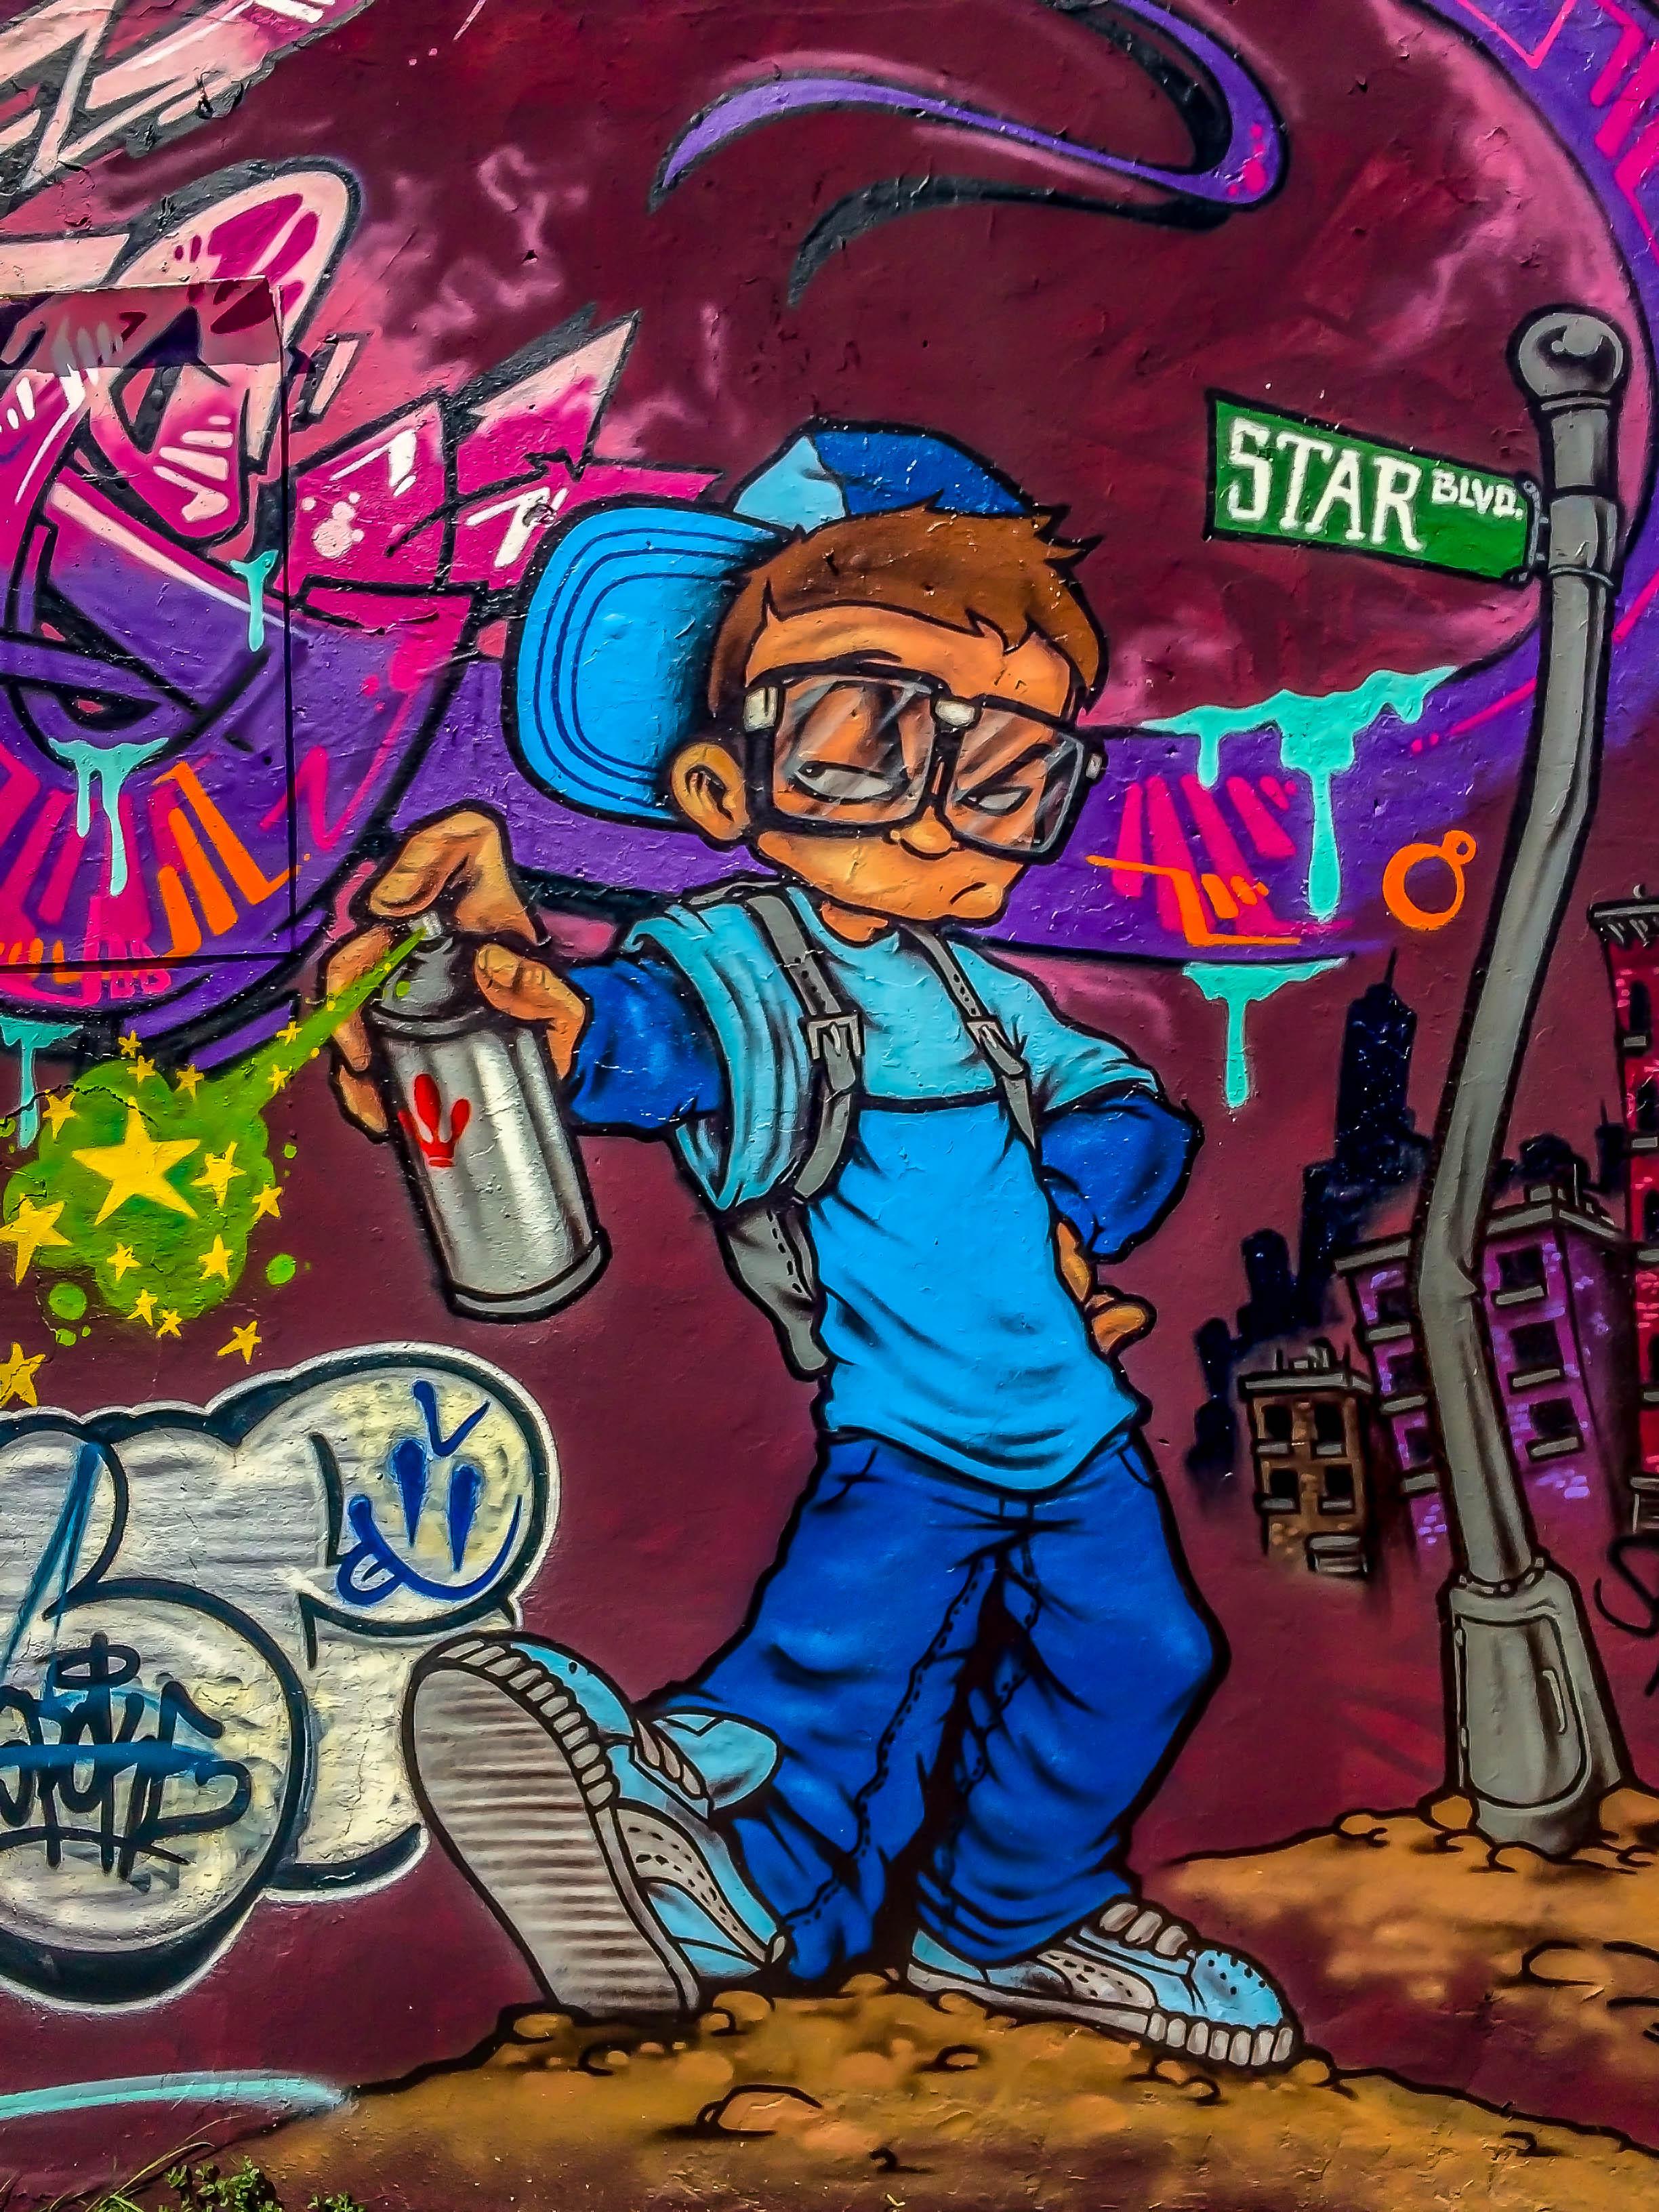 Grafitti 1 - danscape - iPhone (44 of 46).jpg